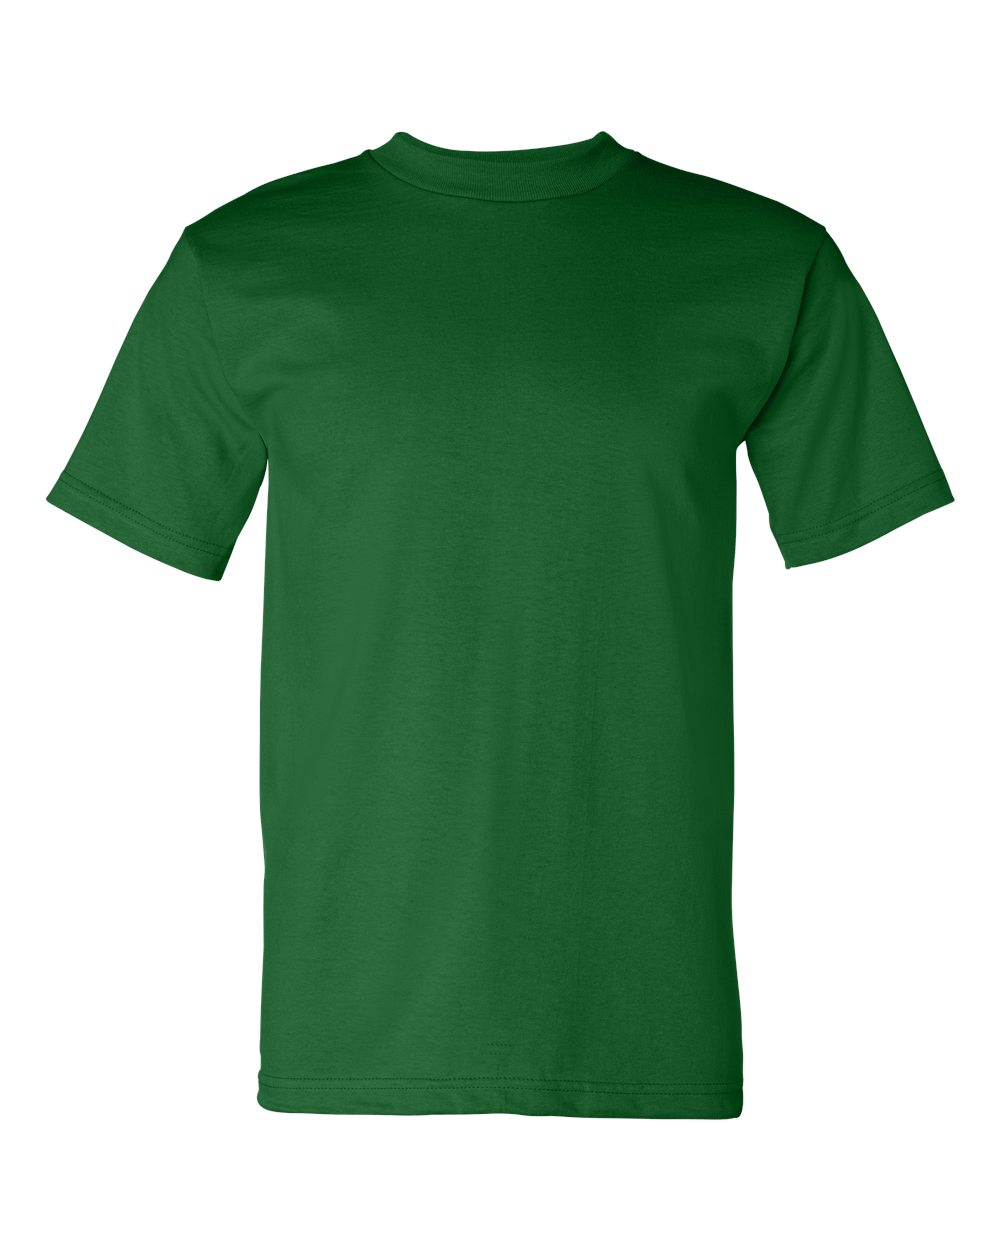 Bayside-Mens-Cotton-Blank-USA-Made-Short-Sleeve-T-Shirt-5100-up-to-5XL thumbnail 21